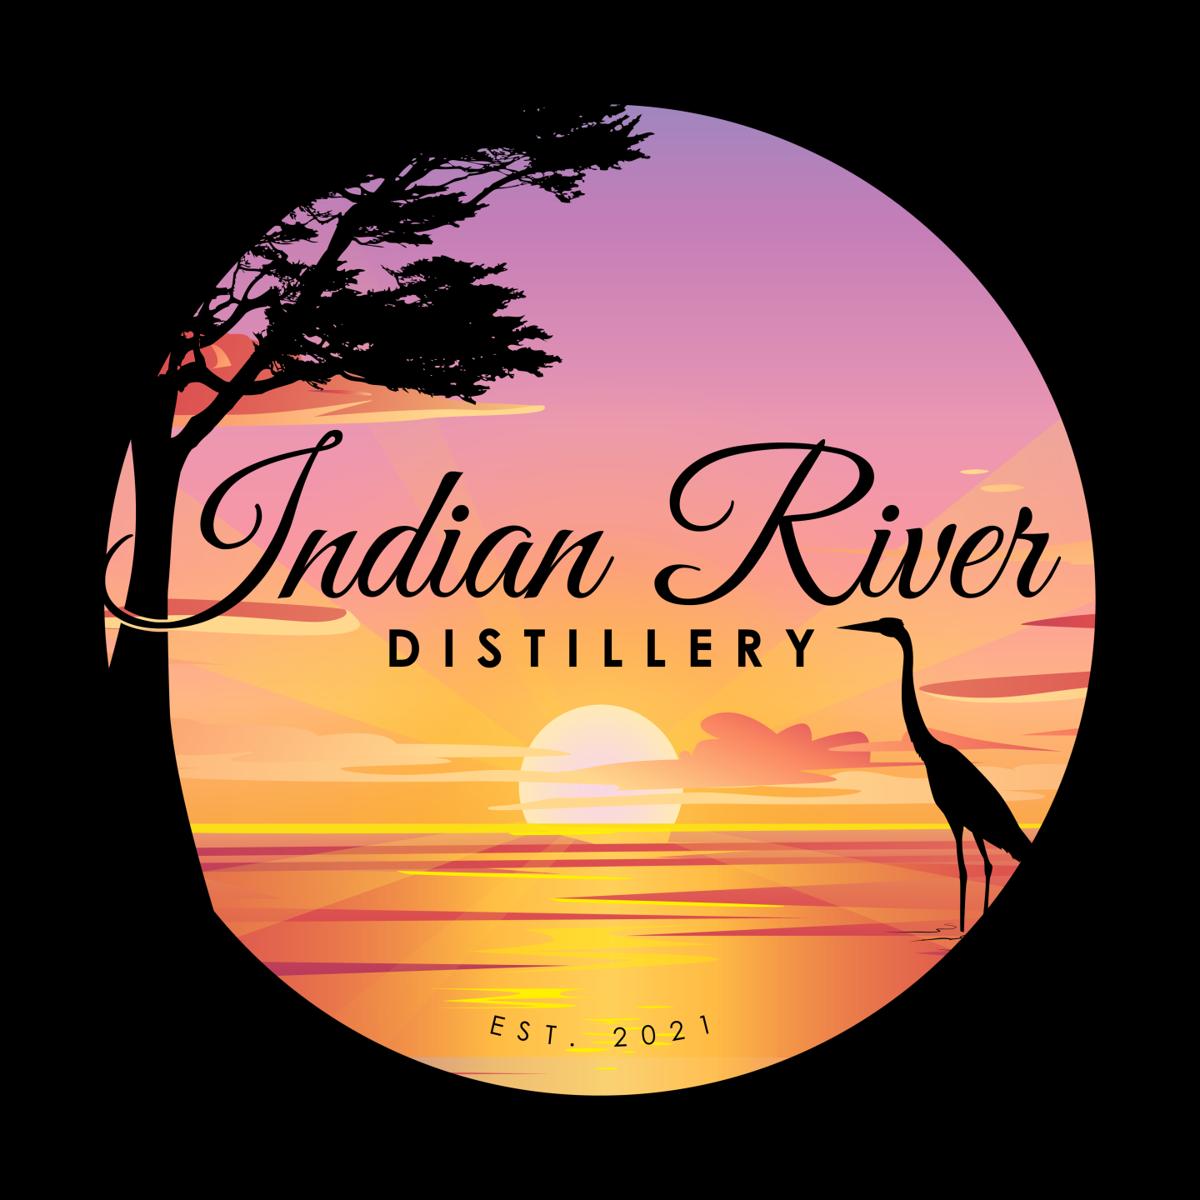 Indian River Distillery logo